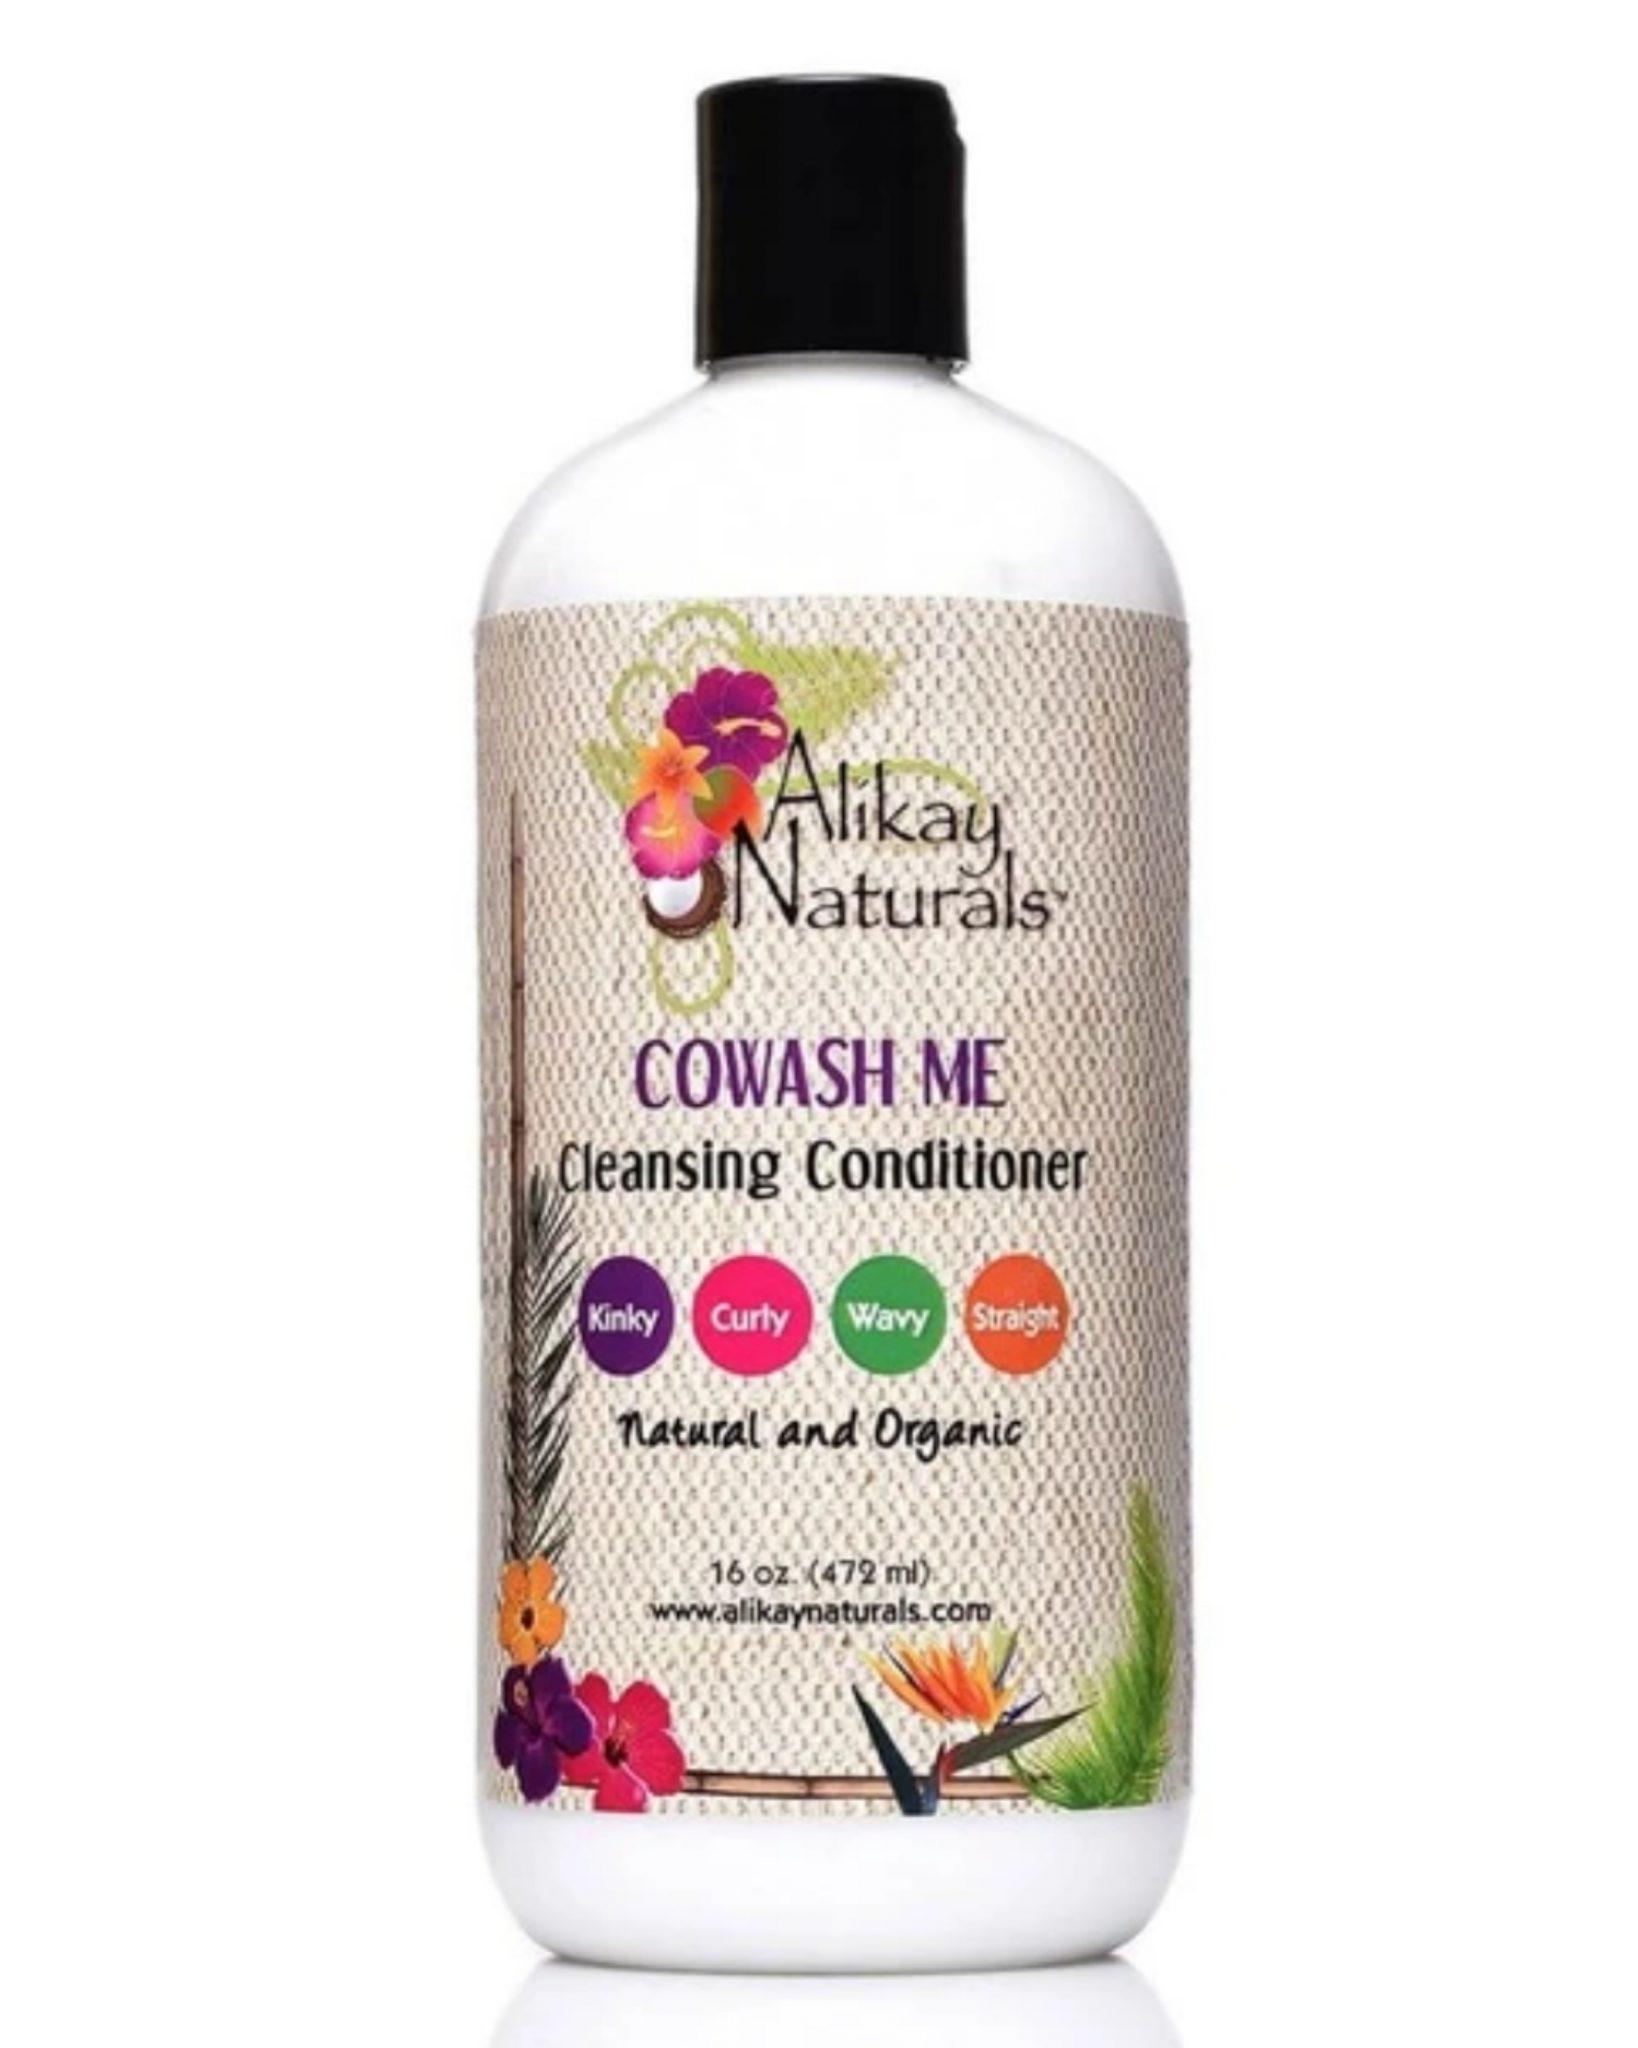 Alikay Naturals Cowash Cleansing Conditioner 16oz